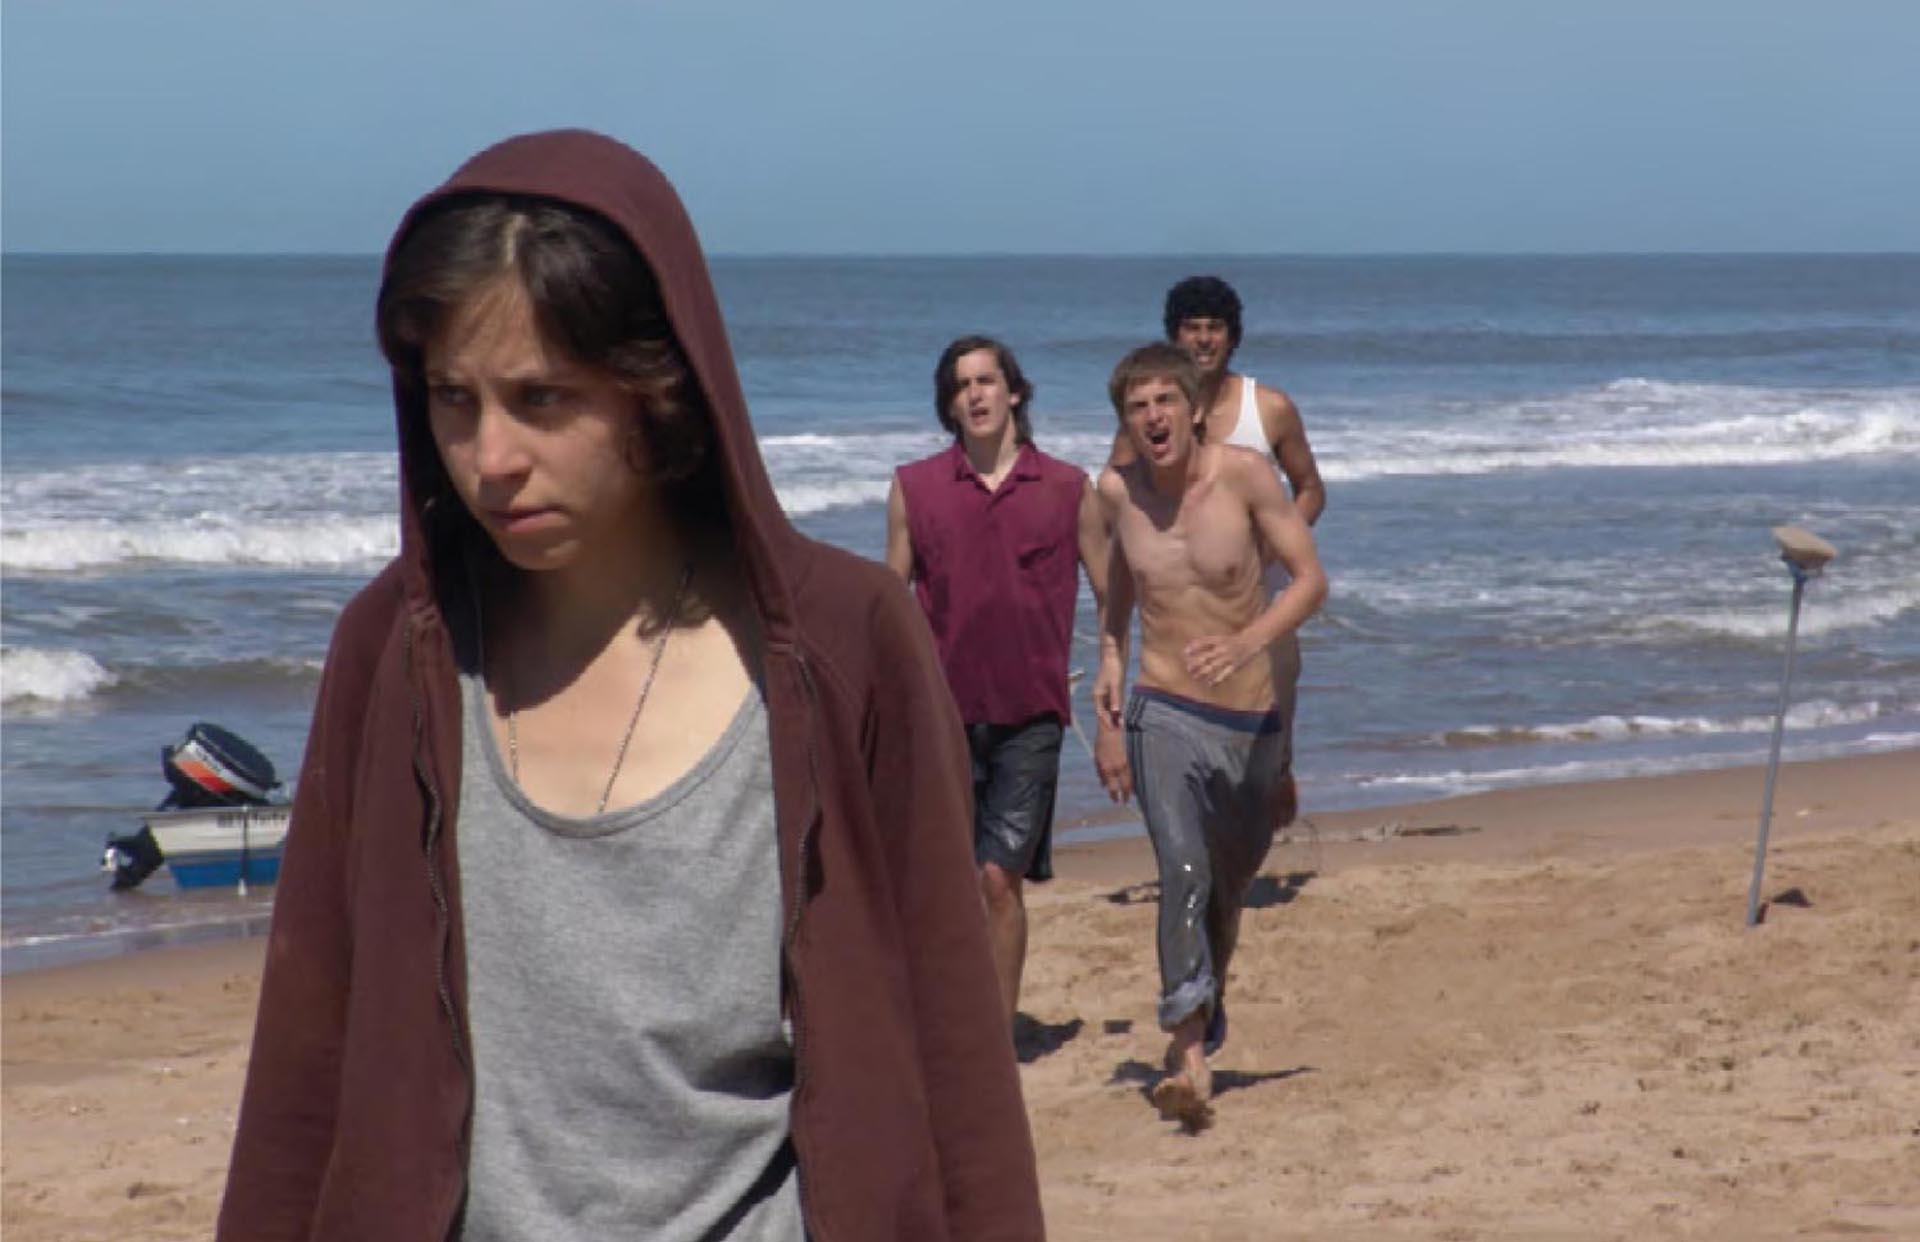 Cherche film d'adolescent - Cinma / Tl - CCM